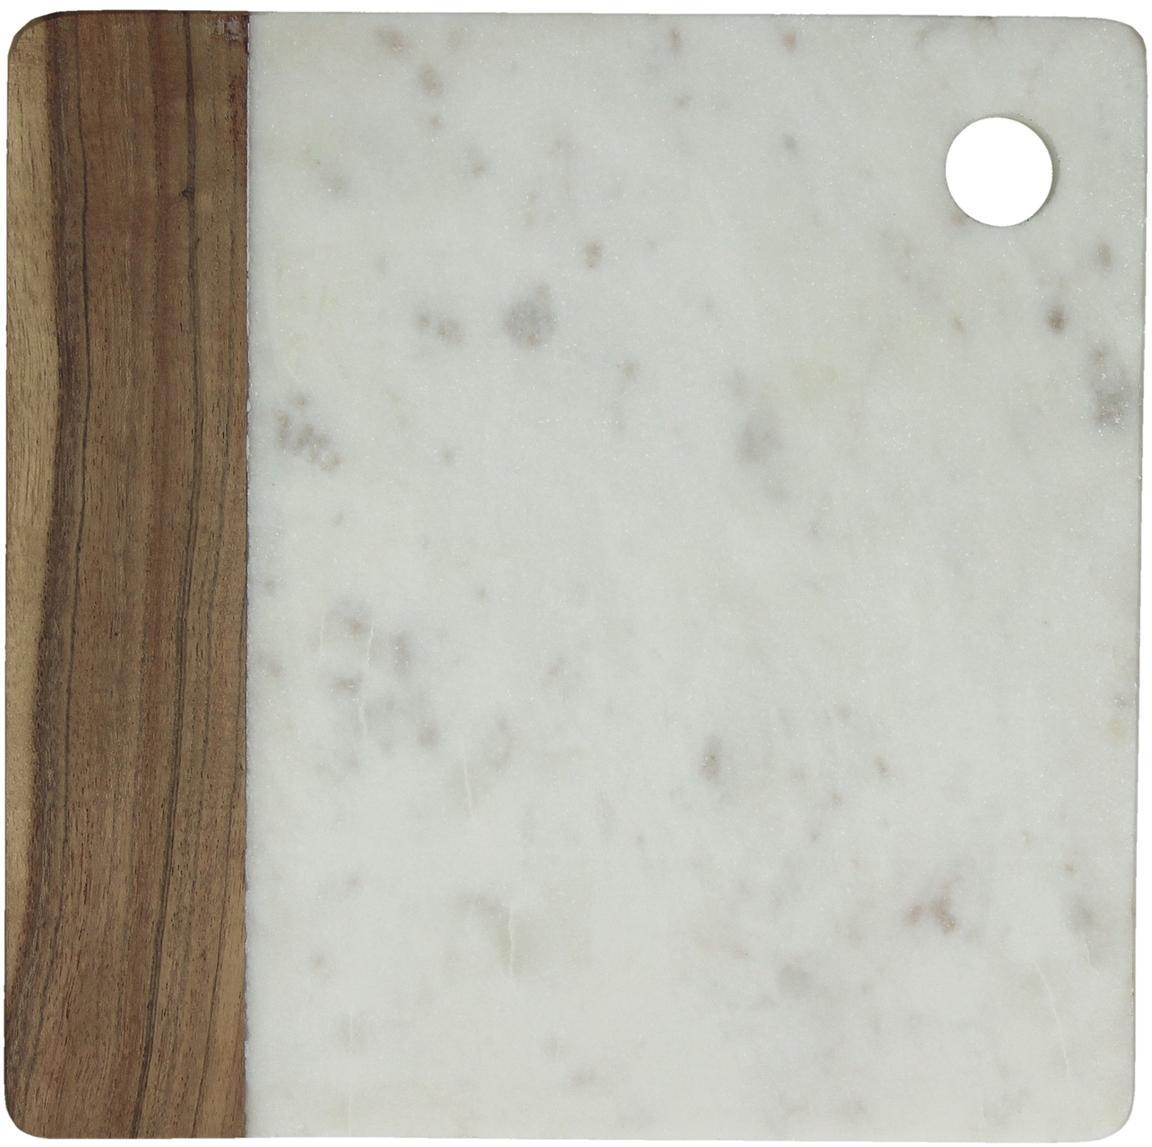 Deska do krojenia z marmuru Idli, Marmur, drewno akacjowe, Biały marmurowy, drewno akacjowe, 25 x 25 cm